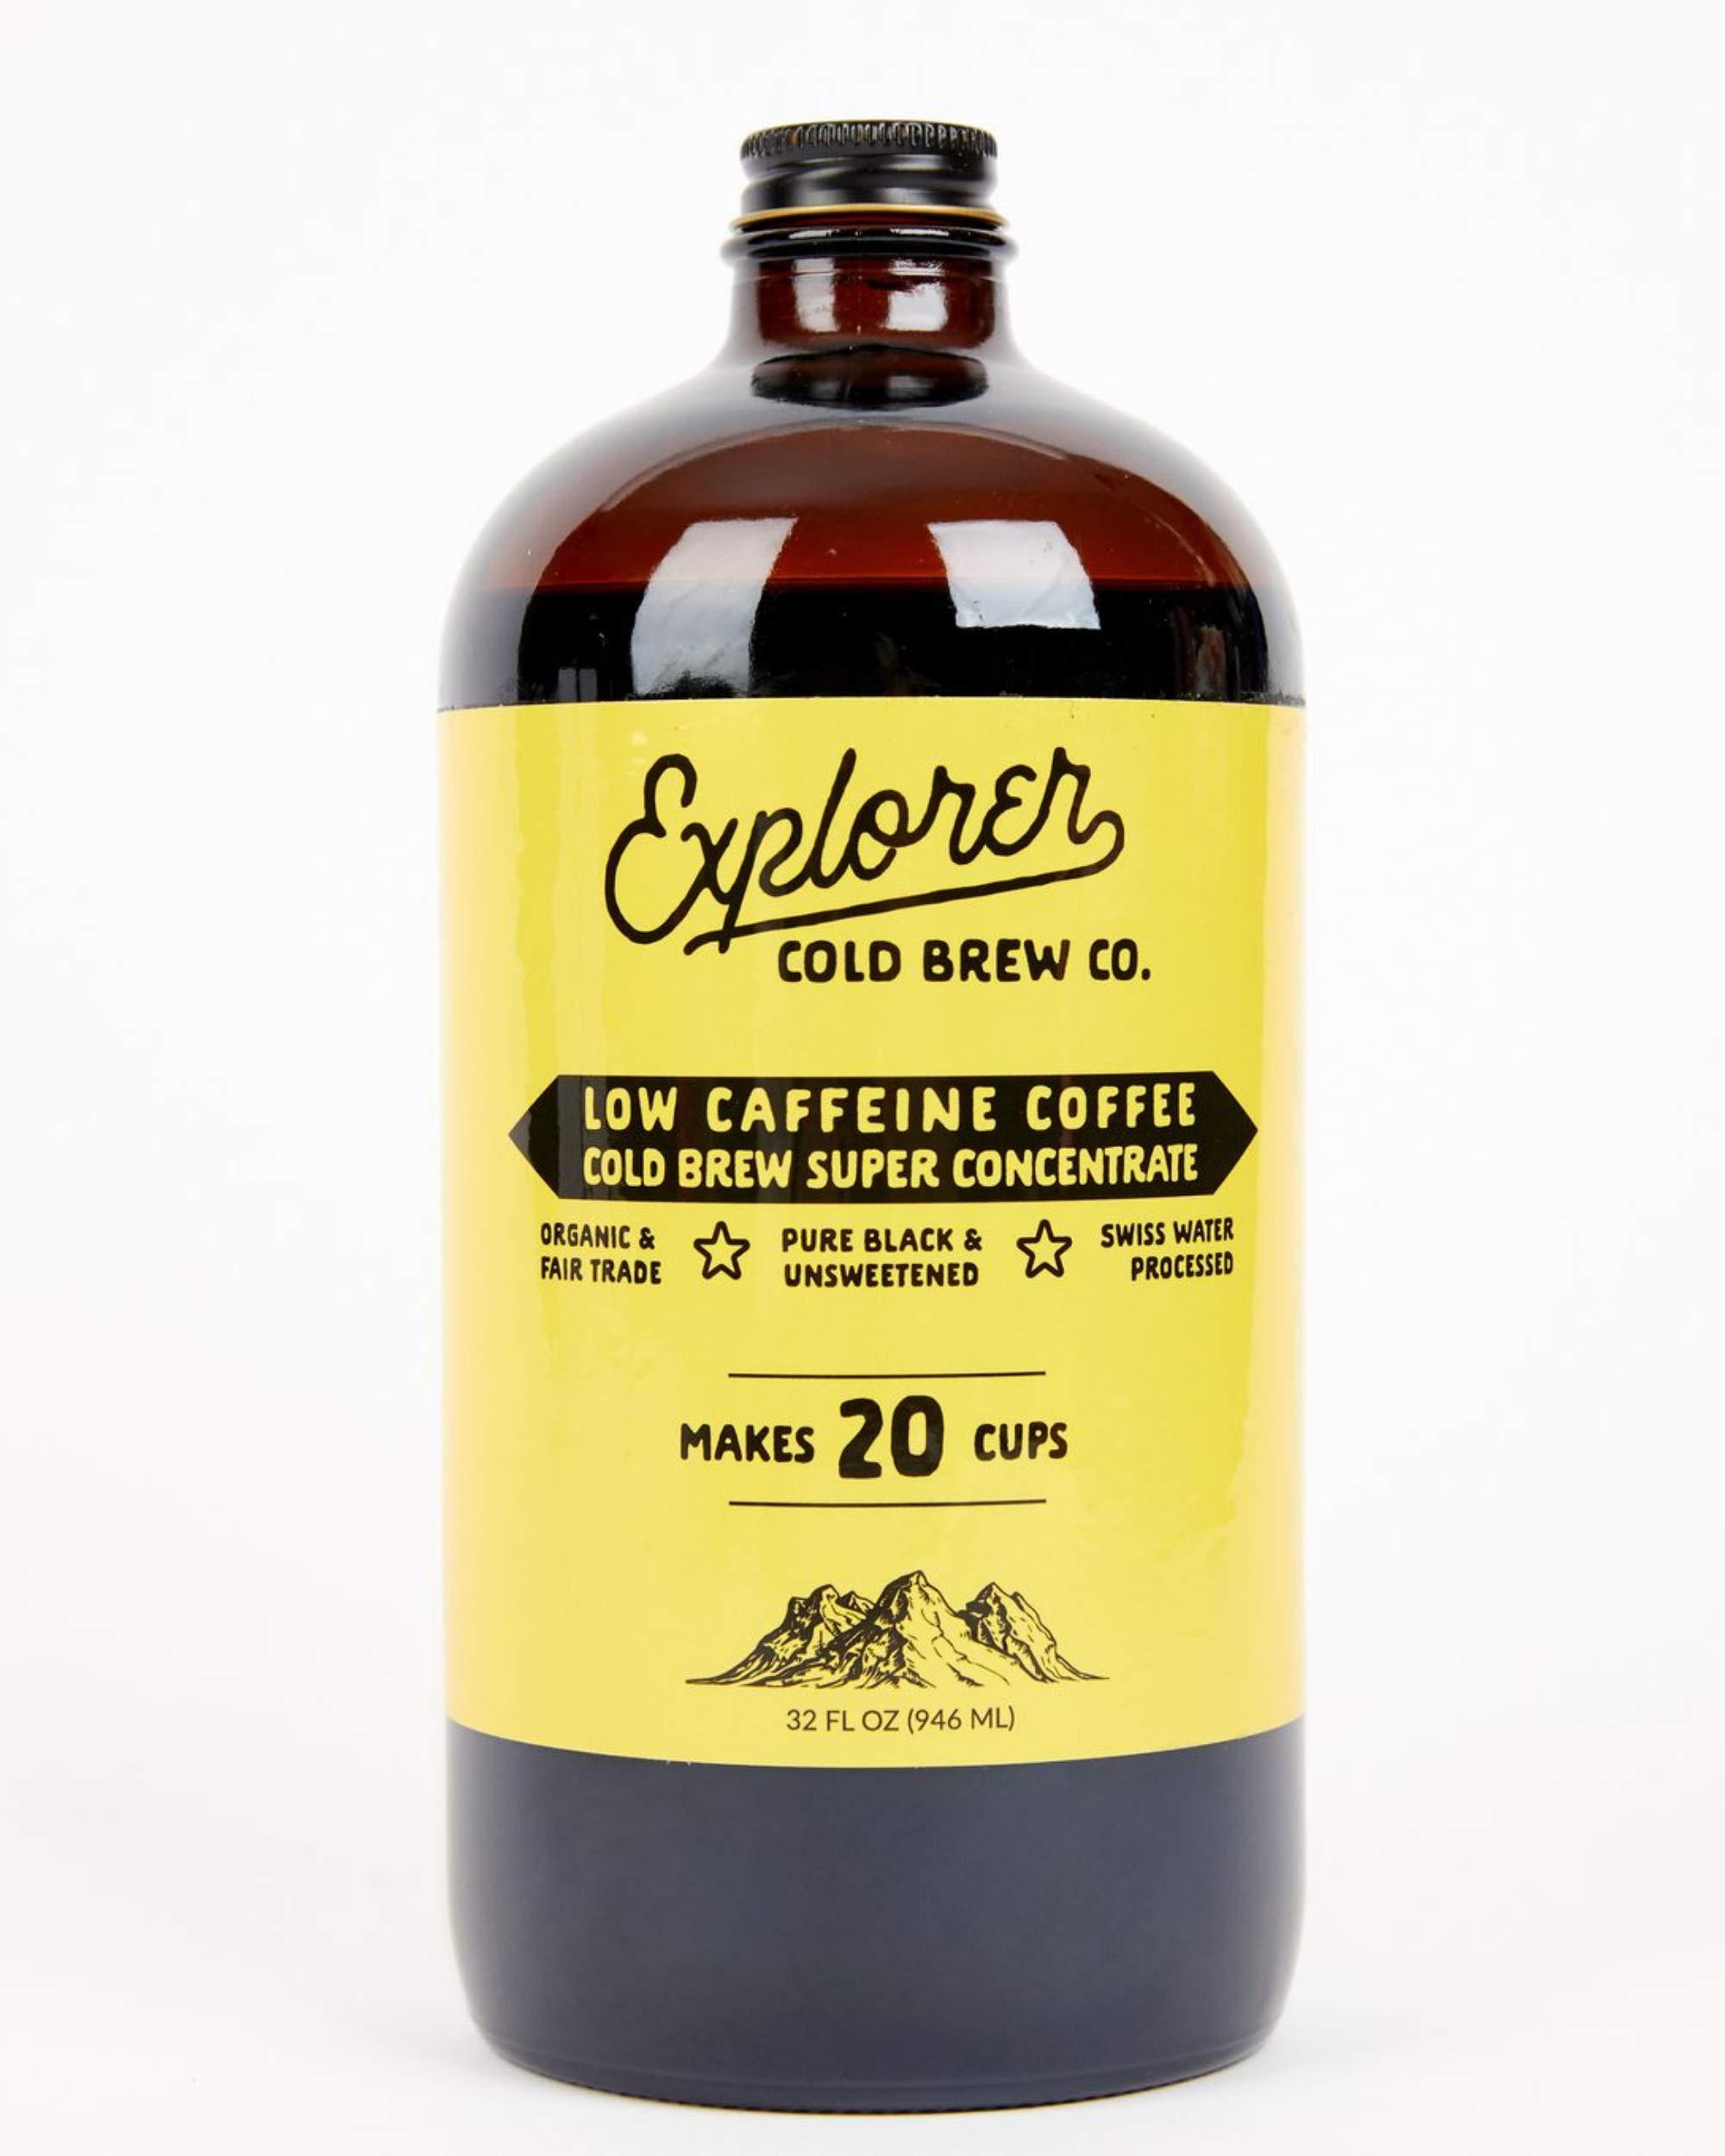 Explorer Cold Brew | Low Caffeine | 1:4 Super Concentrate | Makes 20-30 Coffees | 32oz